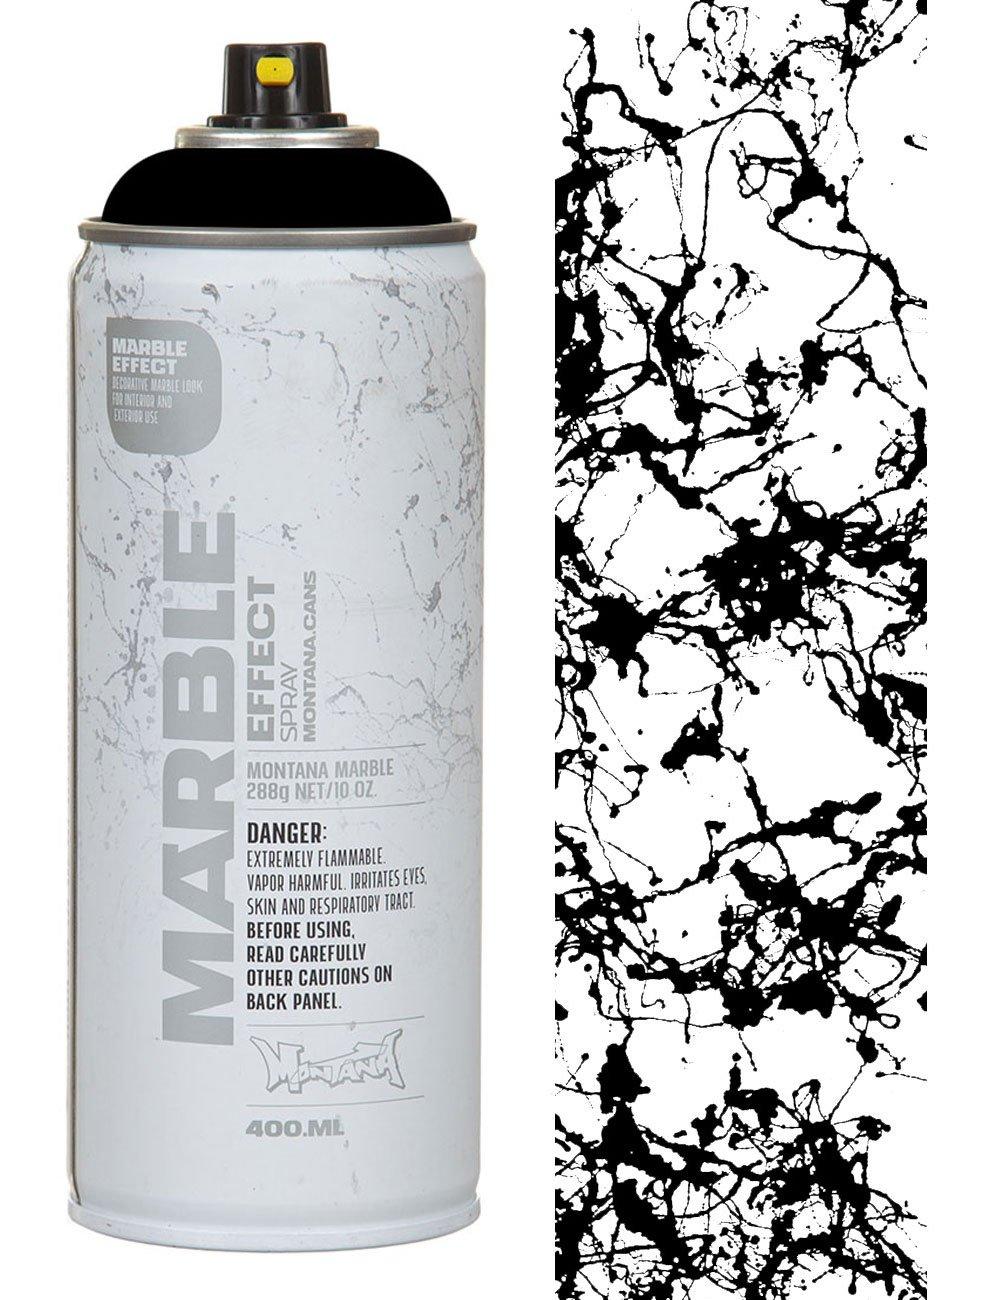 Montana Em9000 Black Marble Effect Spray Paint 400ml Spray Paint Supplies From Fat Buddha Store Uk